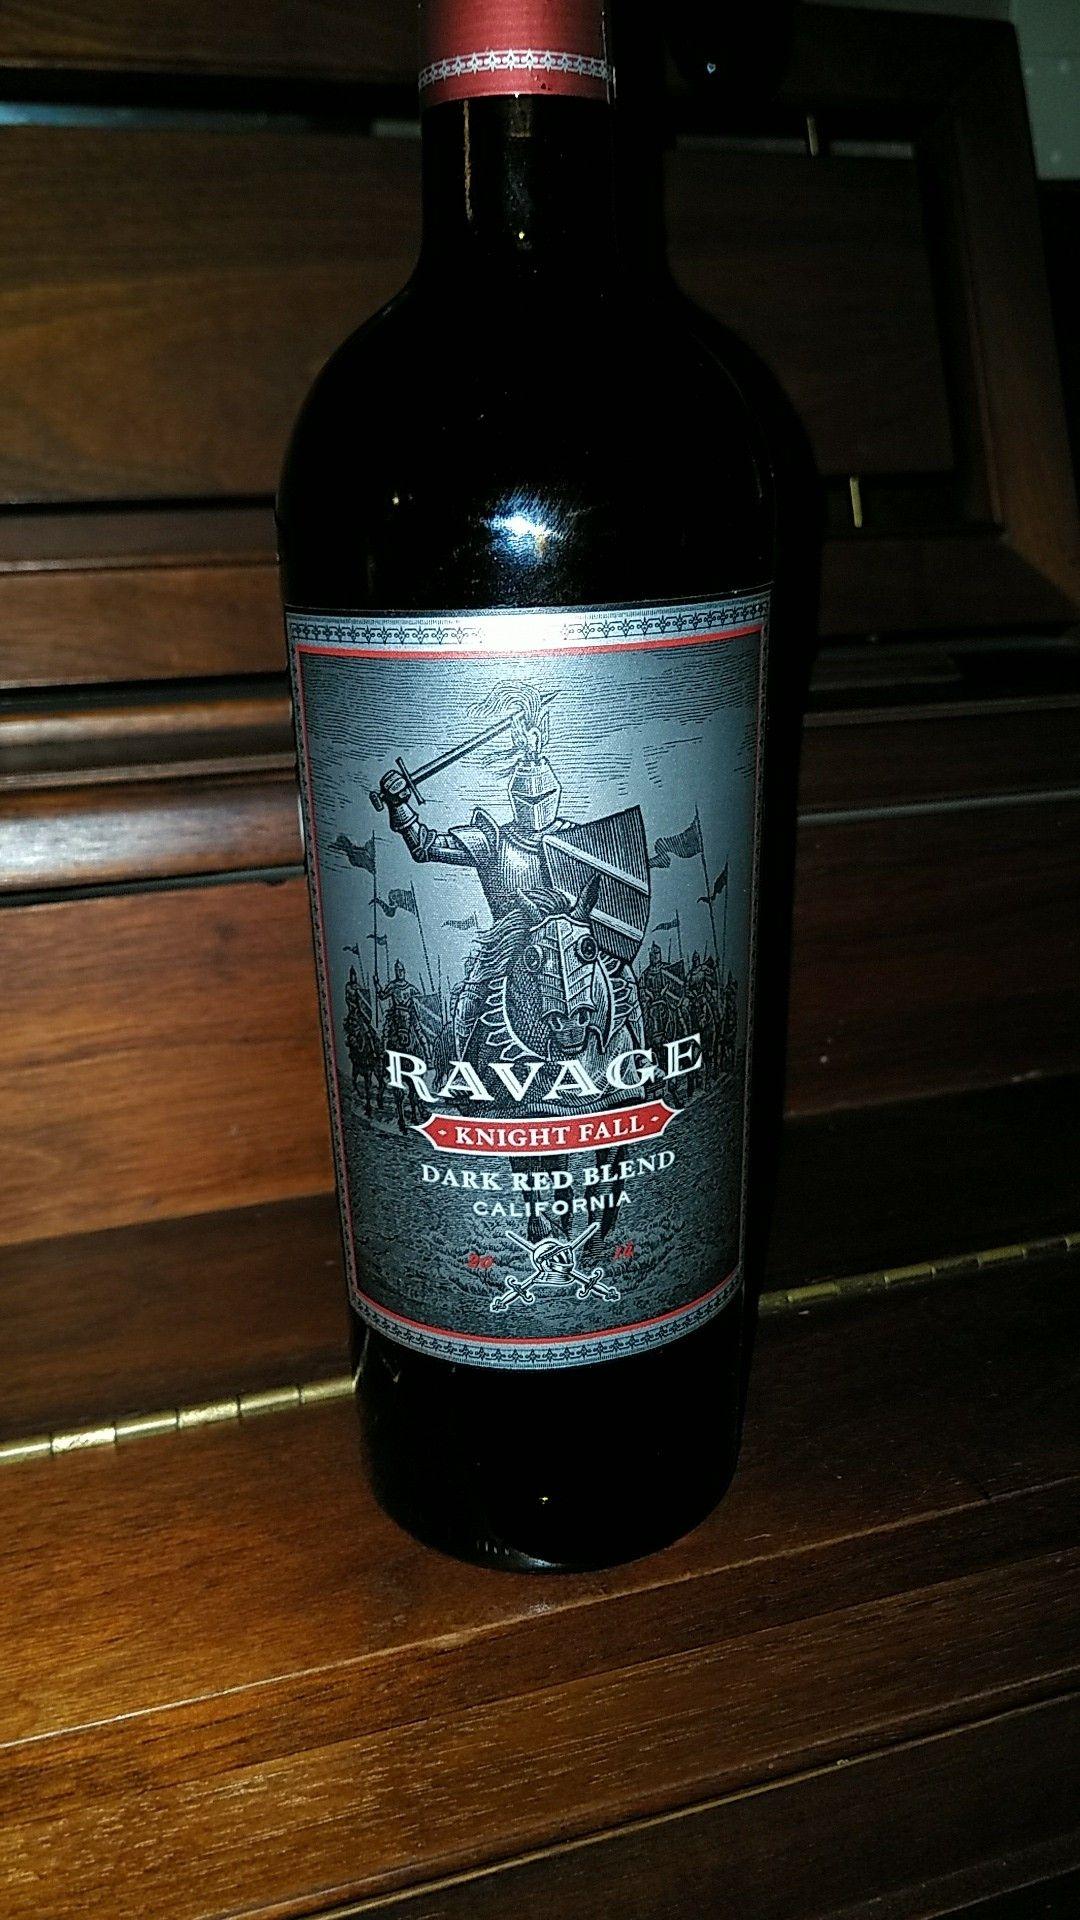 Ravage - Knight Fall Dark red blend California Sam\'s Club St Louis ...